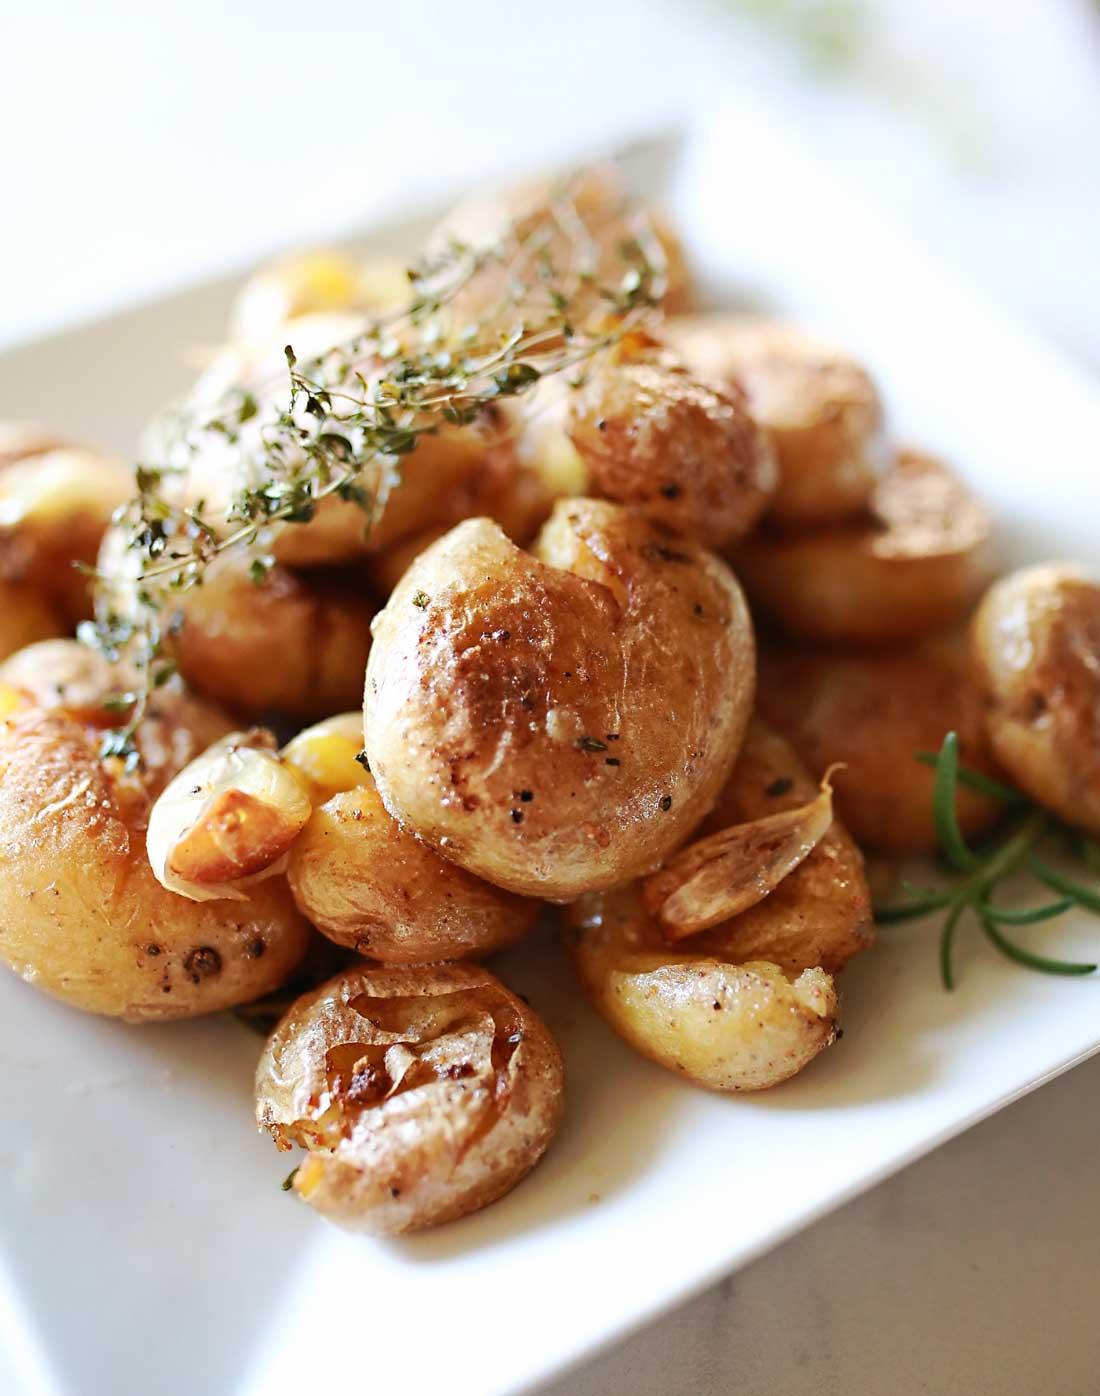 Smashed potatoes, roasted marble potatoes that taste glorious!